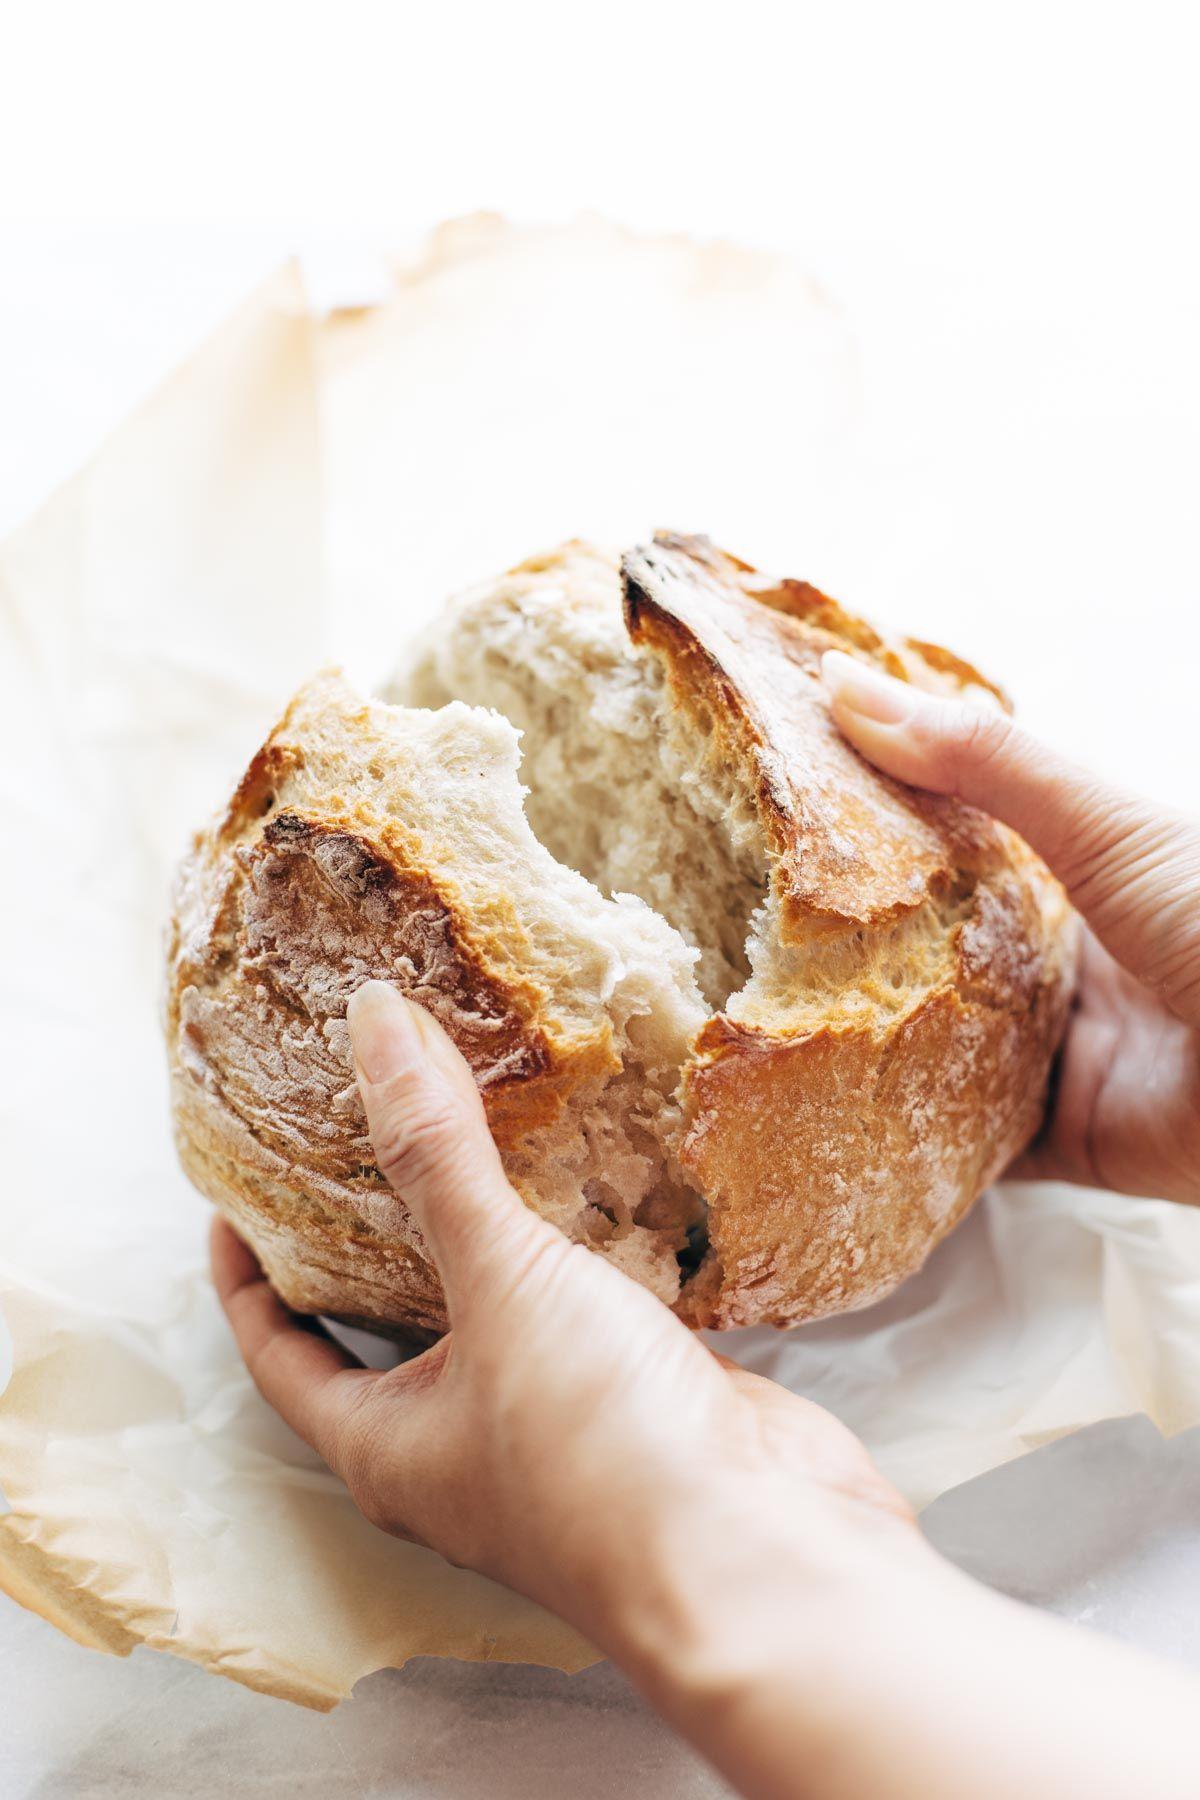 Картинки по запросу свежий хлеб